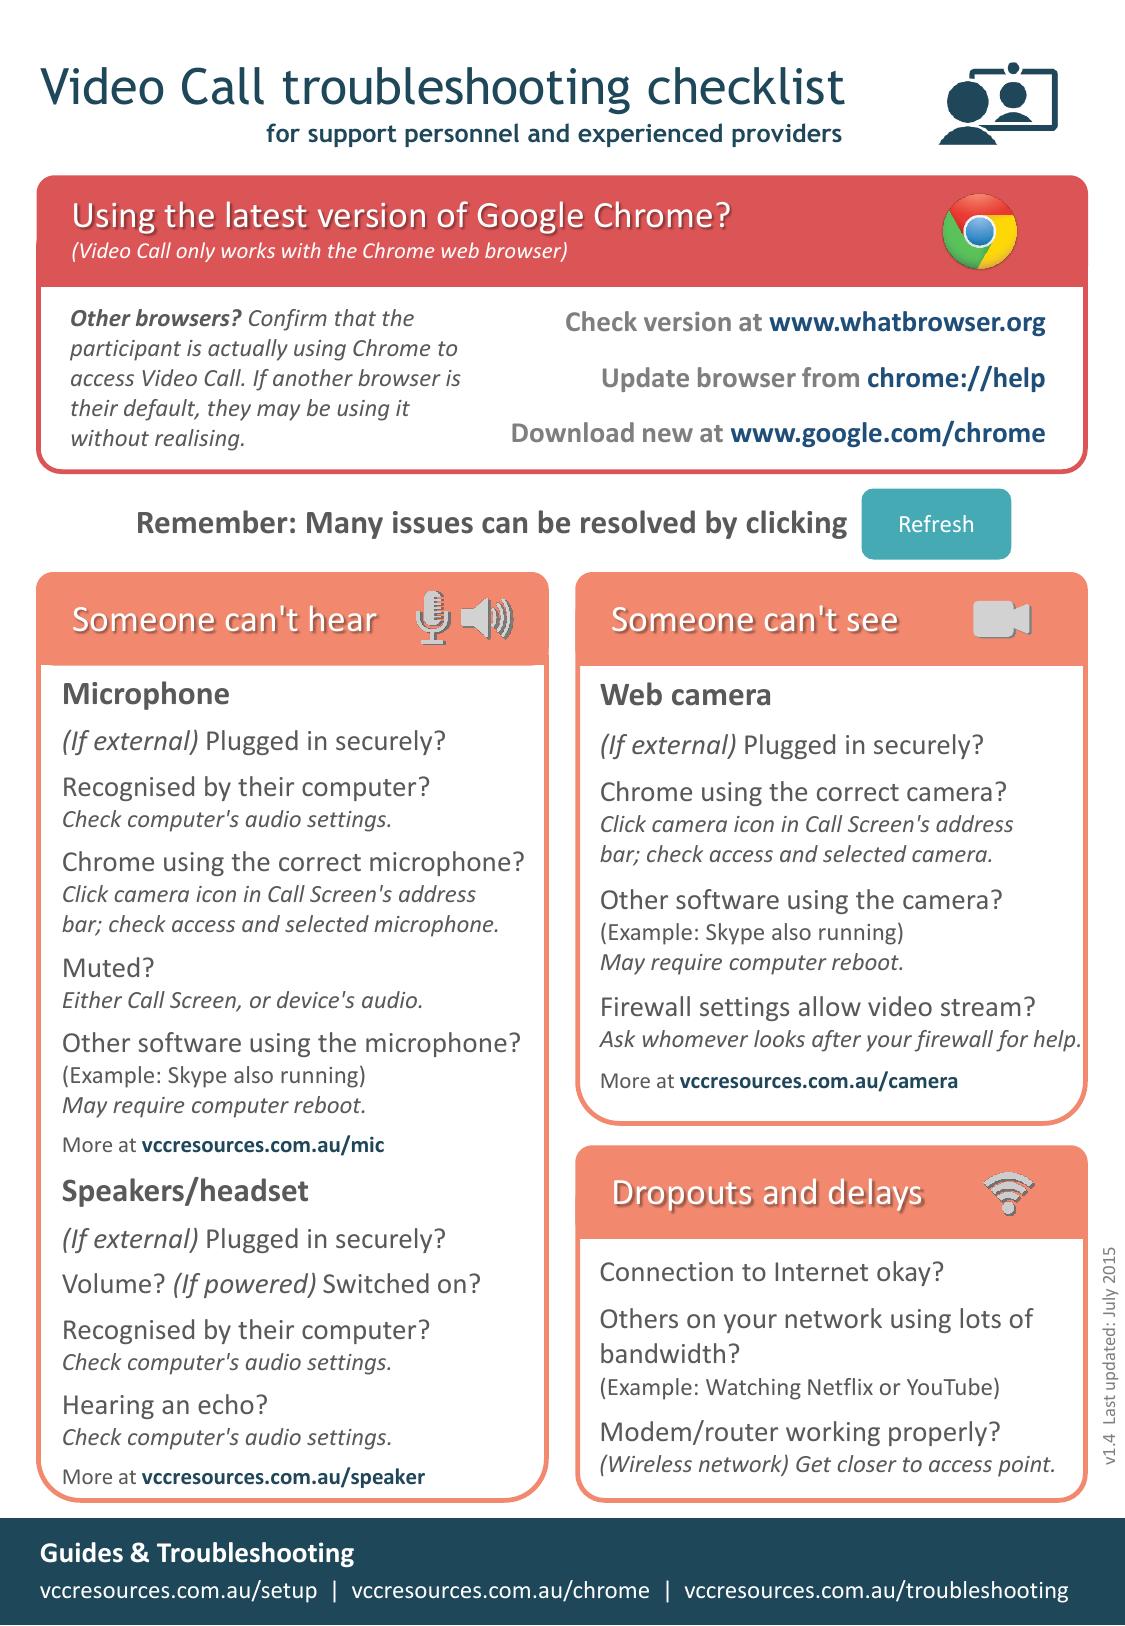 Video Call Troubleshooting Checklist | manualzz com